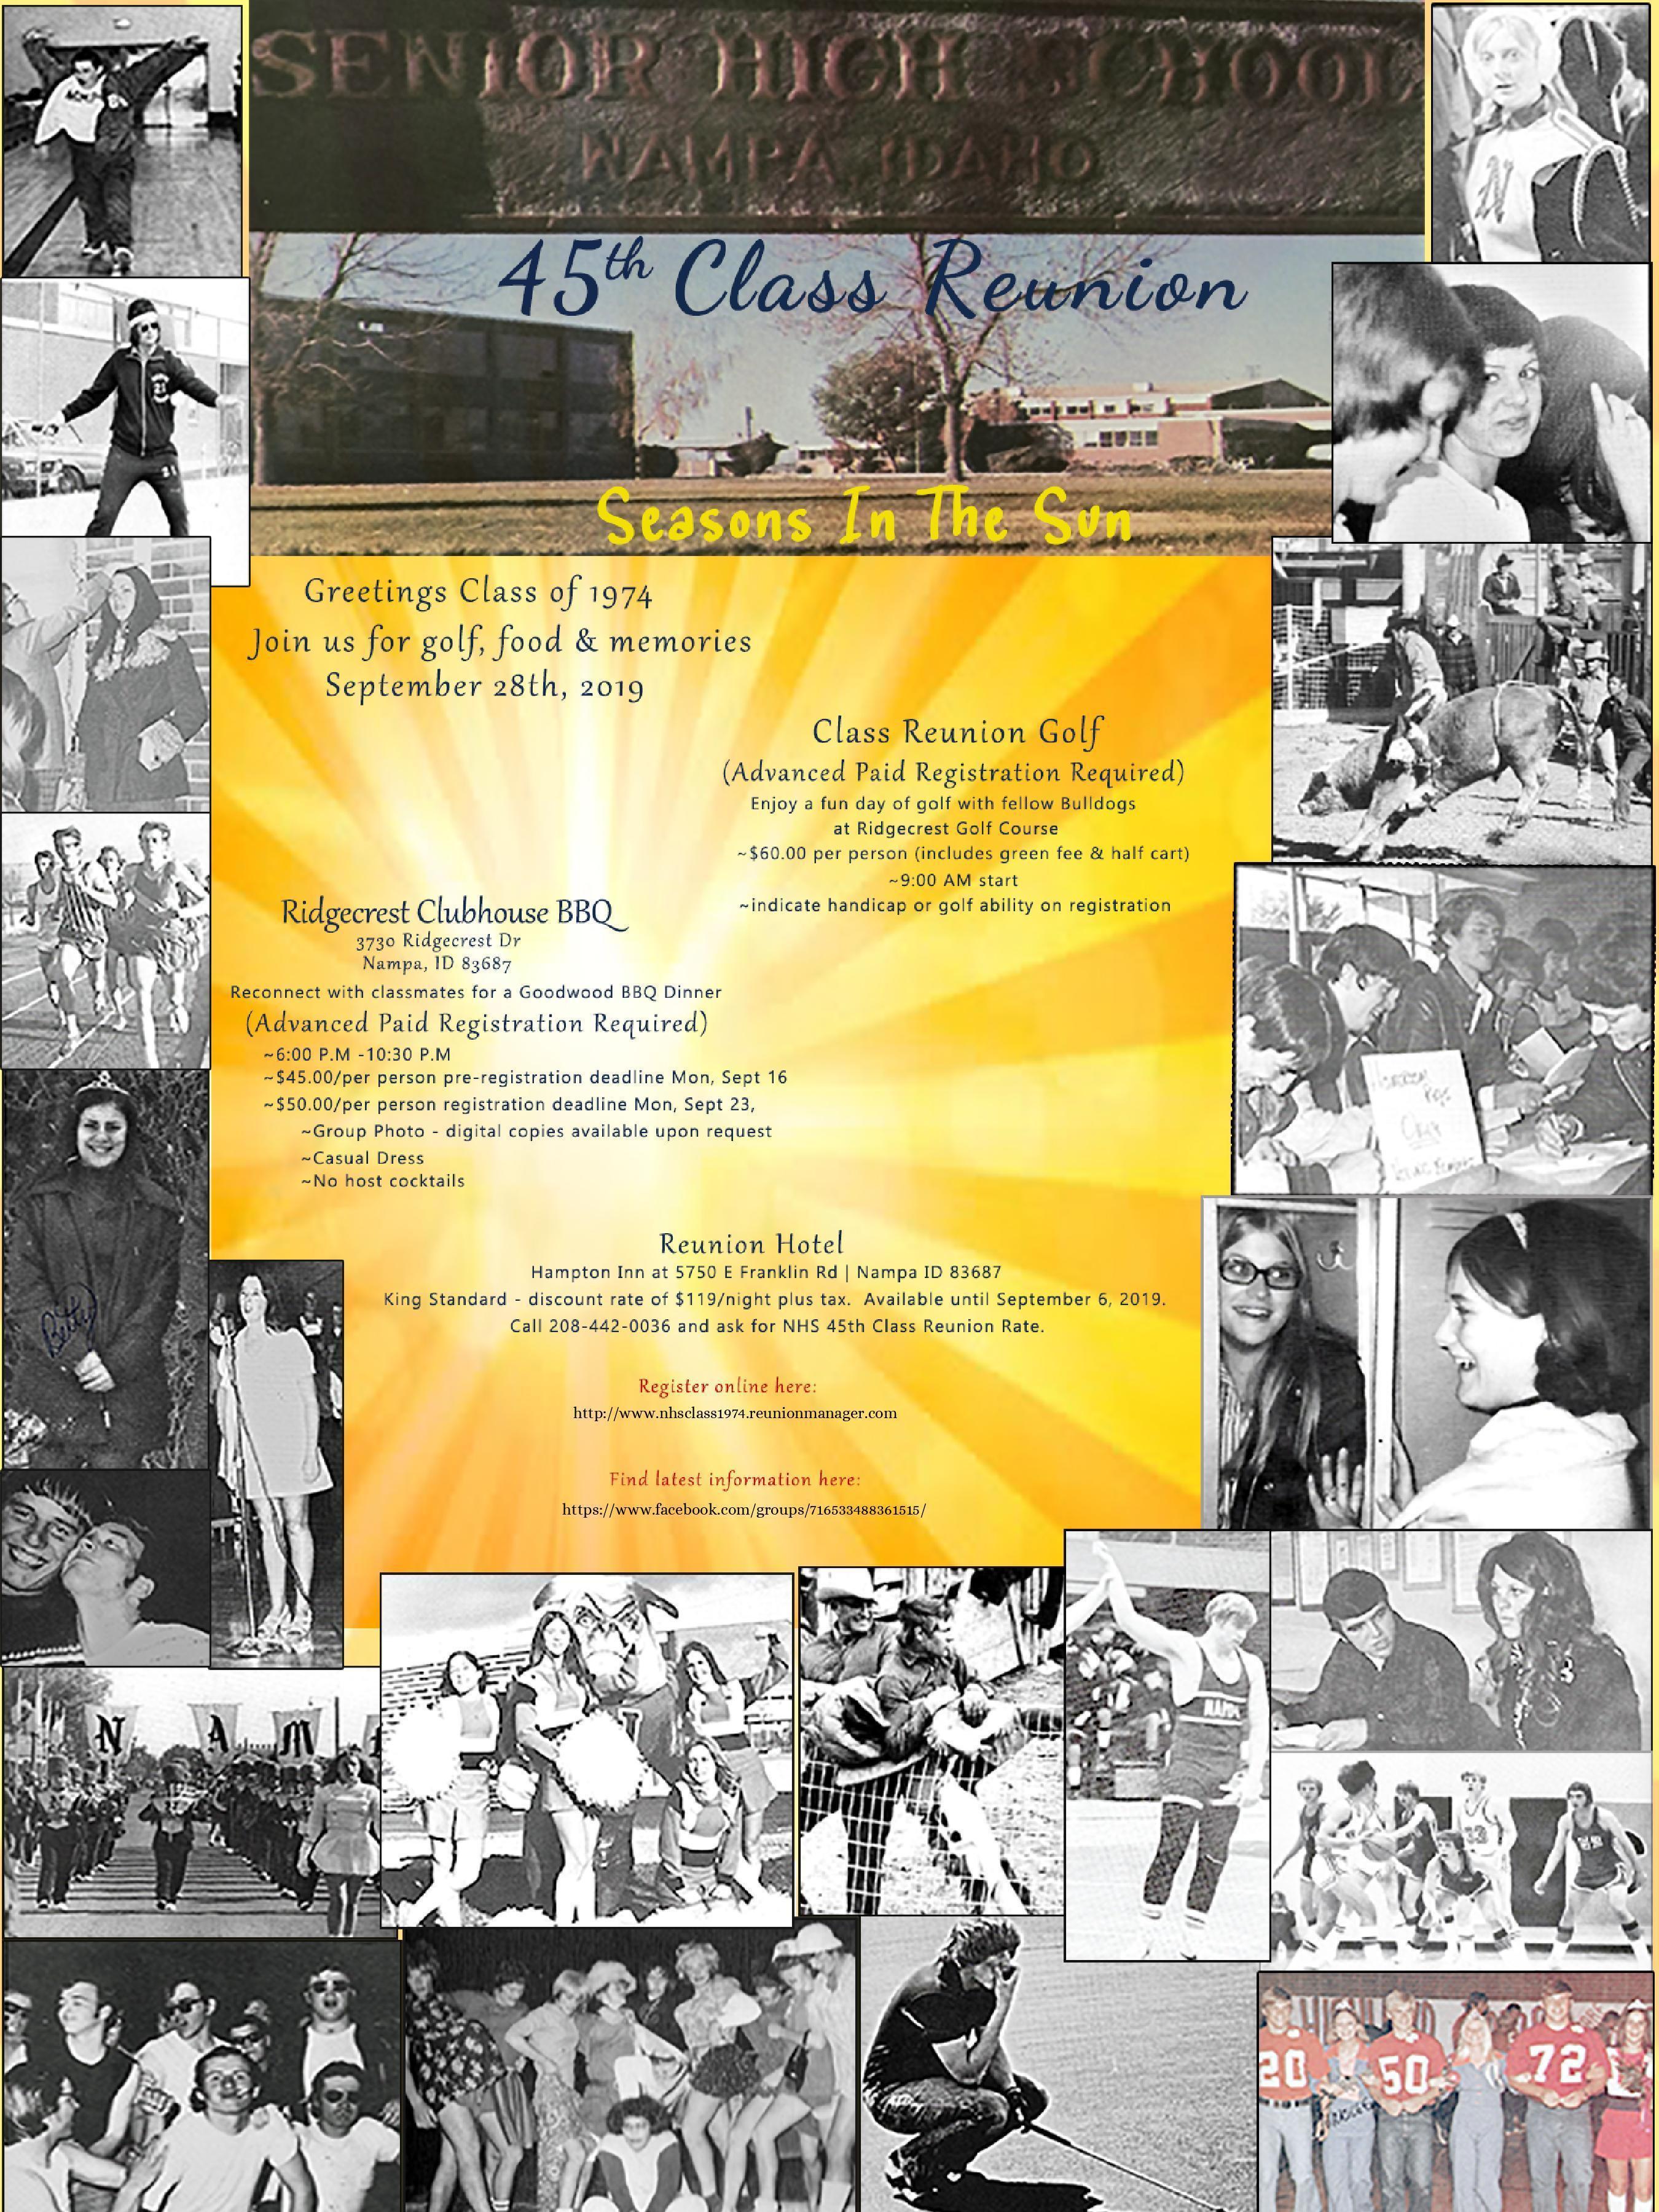 Yearbook Photos, Invitation